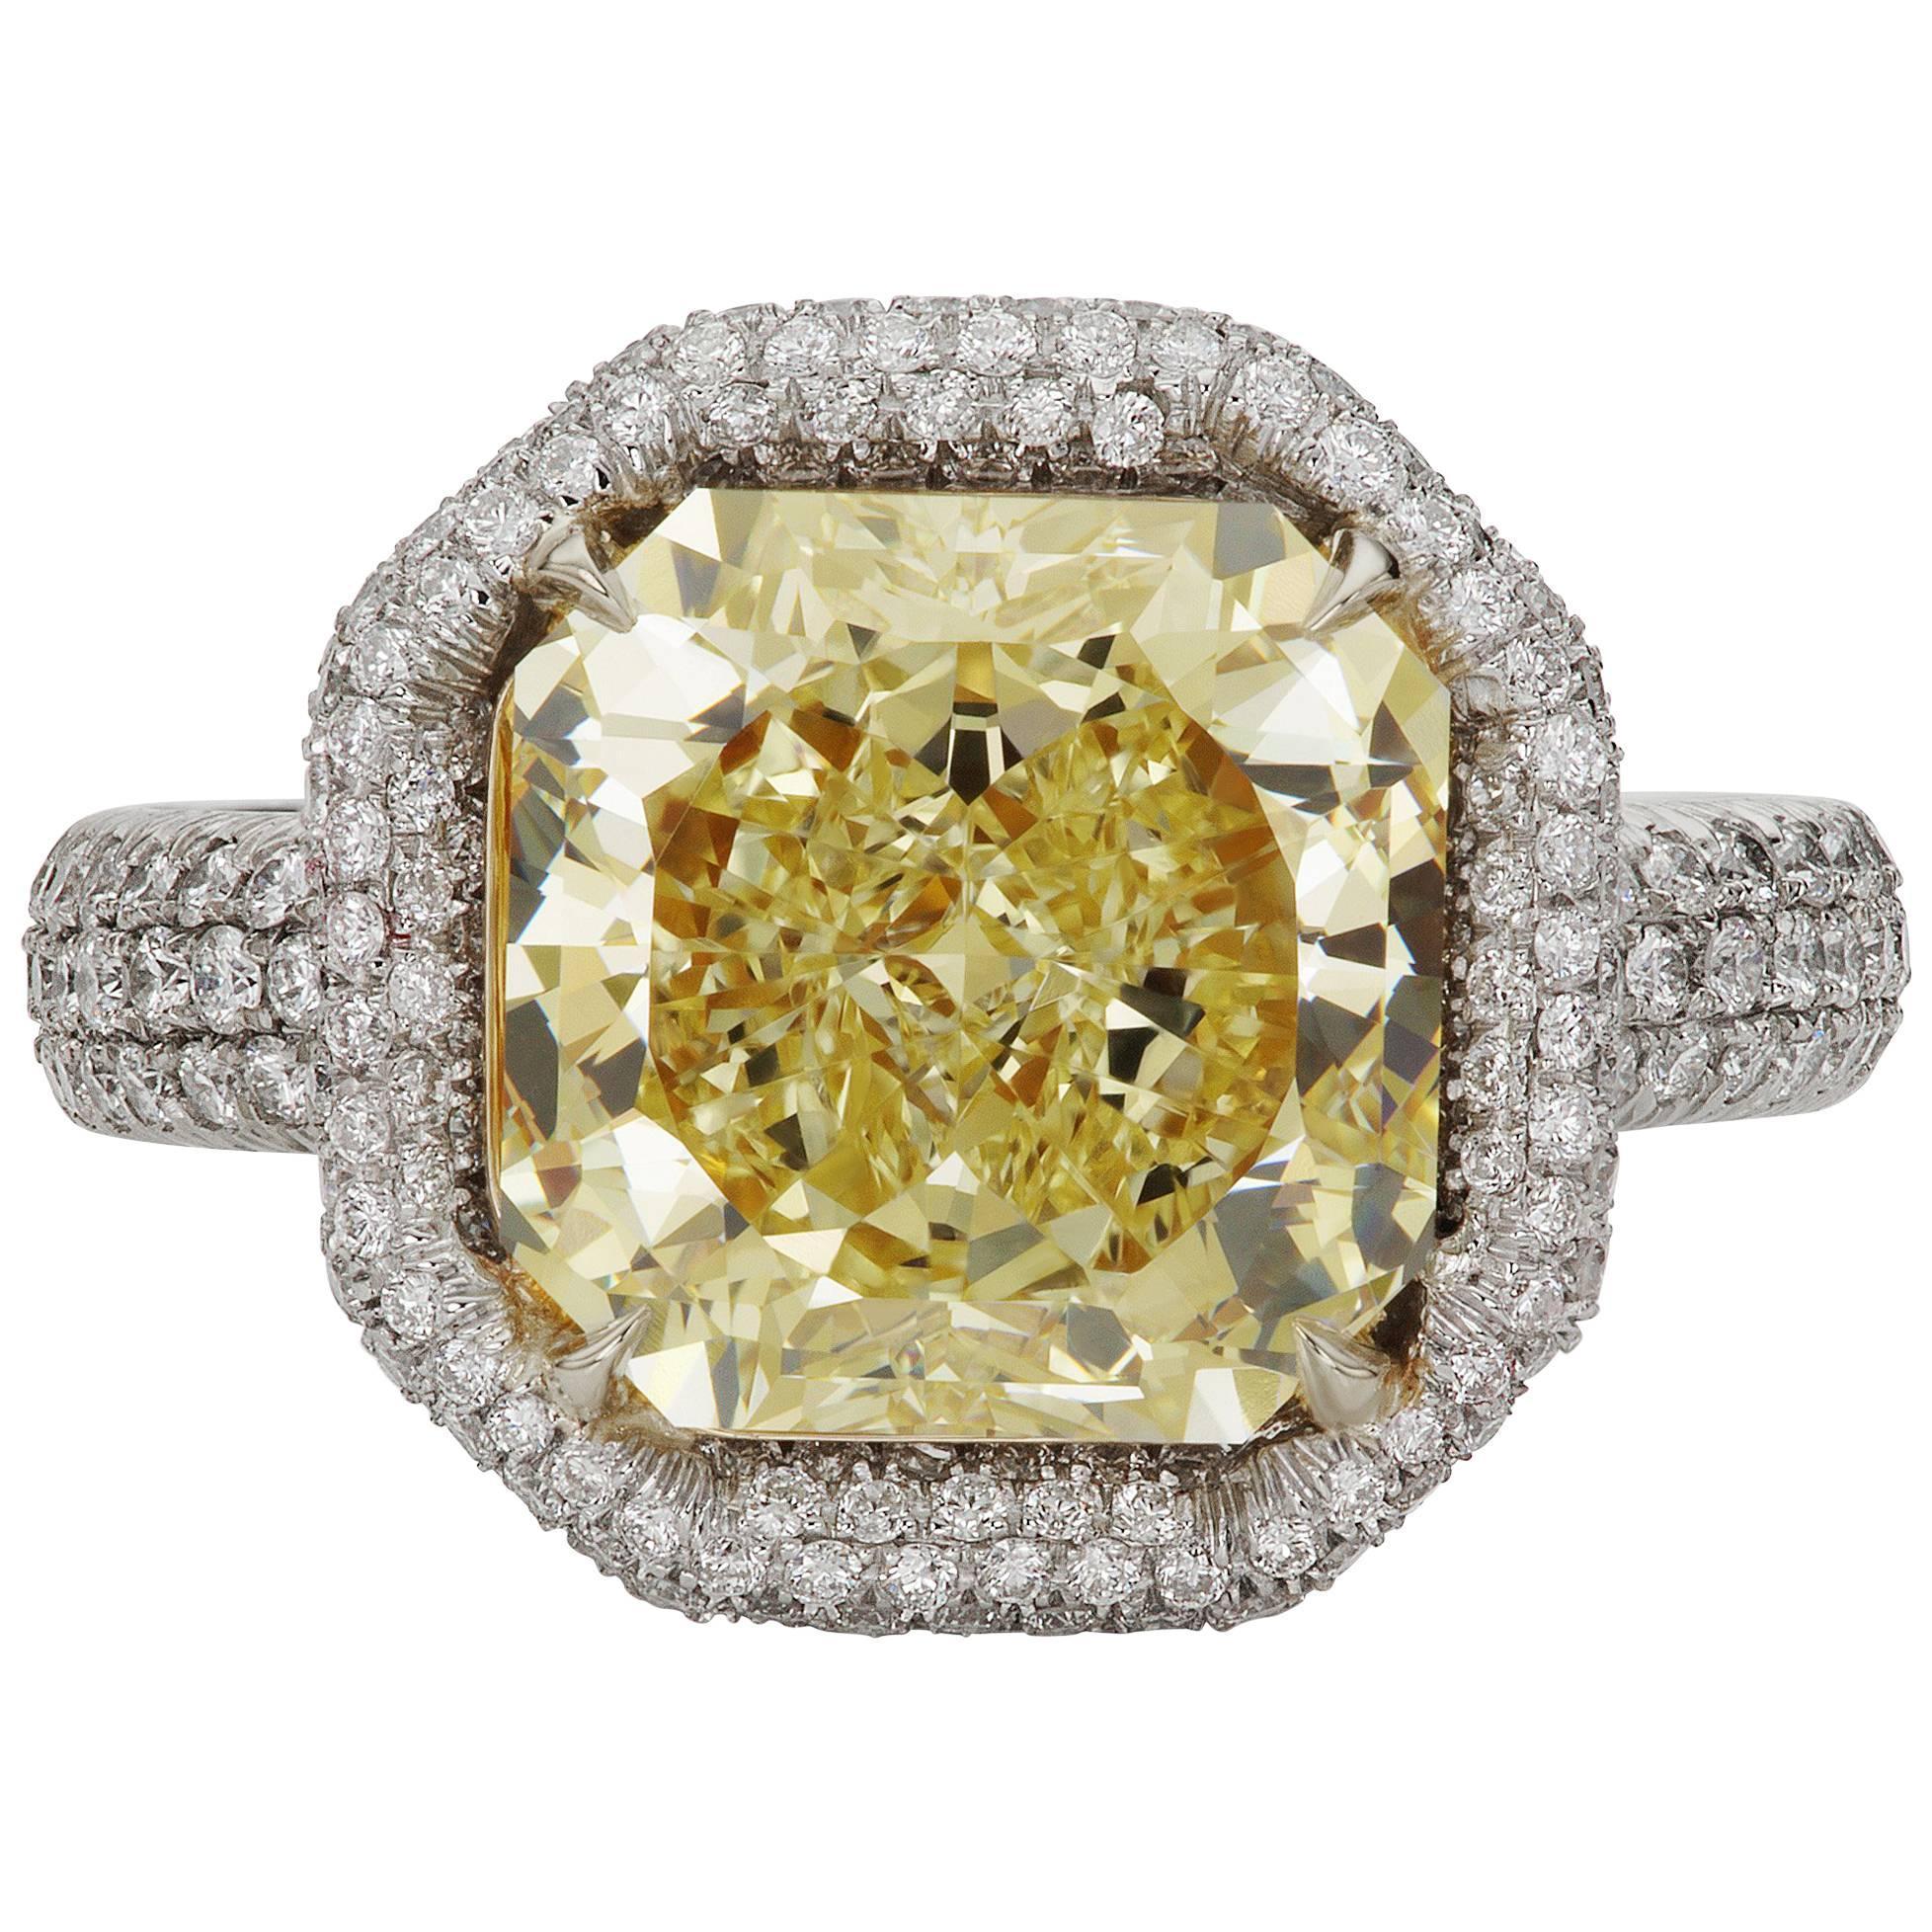 Scarselli 4 carat Yellow Radiant Cut Diamond Engagement Ring in Platinum